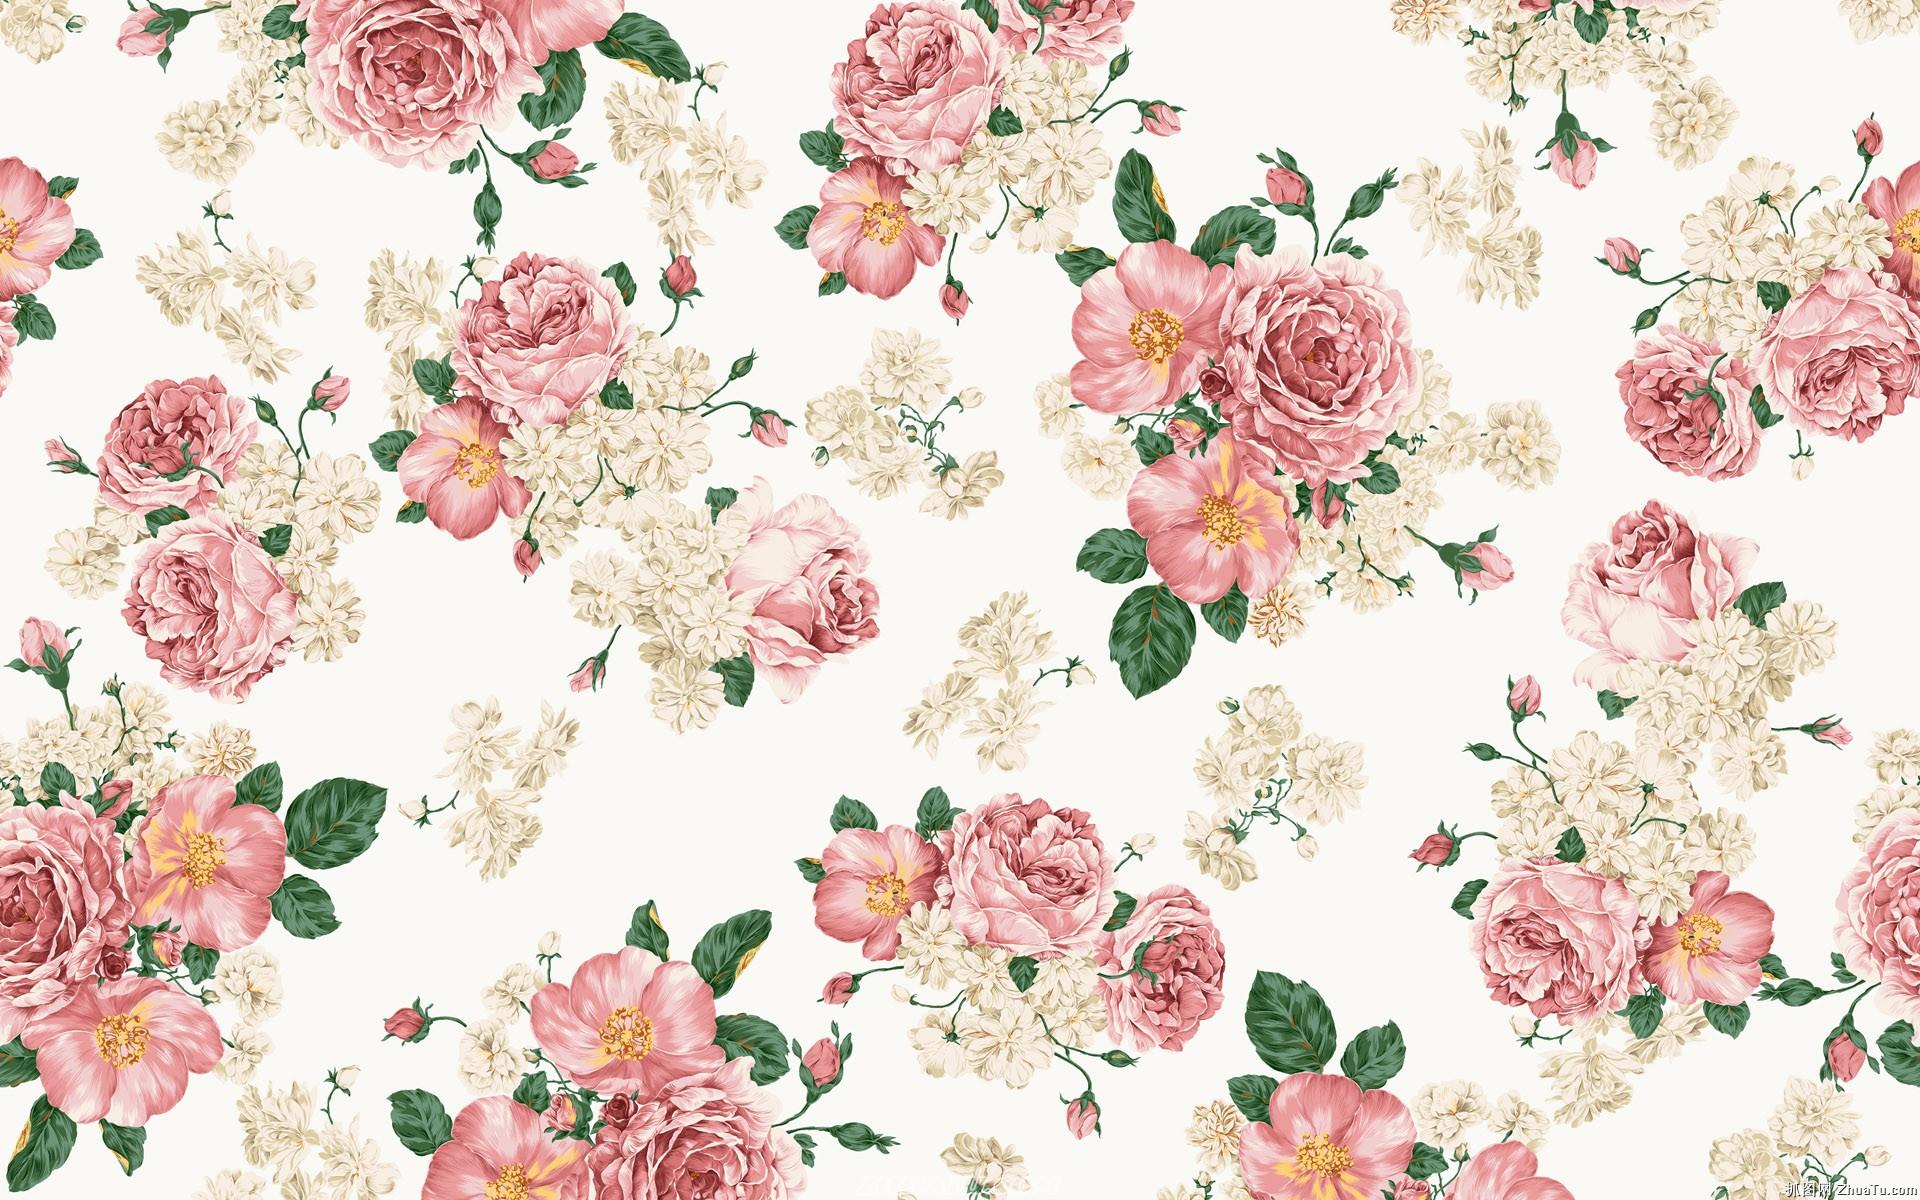 графика космос цветы роза graphics space flowers rose  № 927148 бесплатно